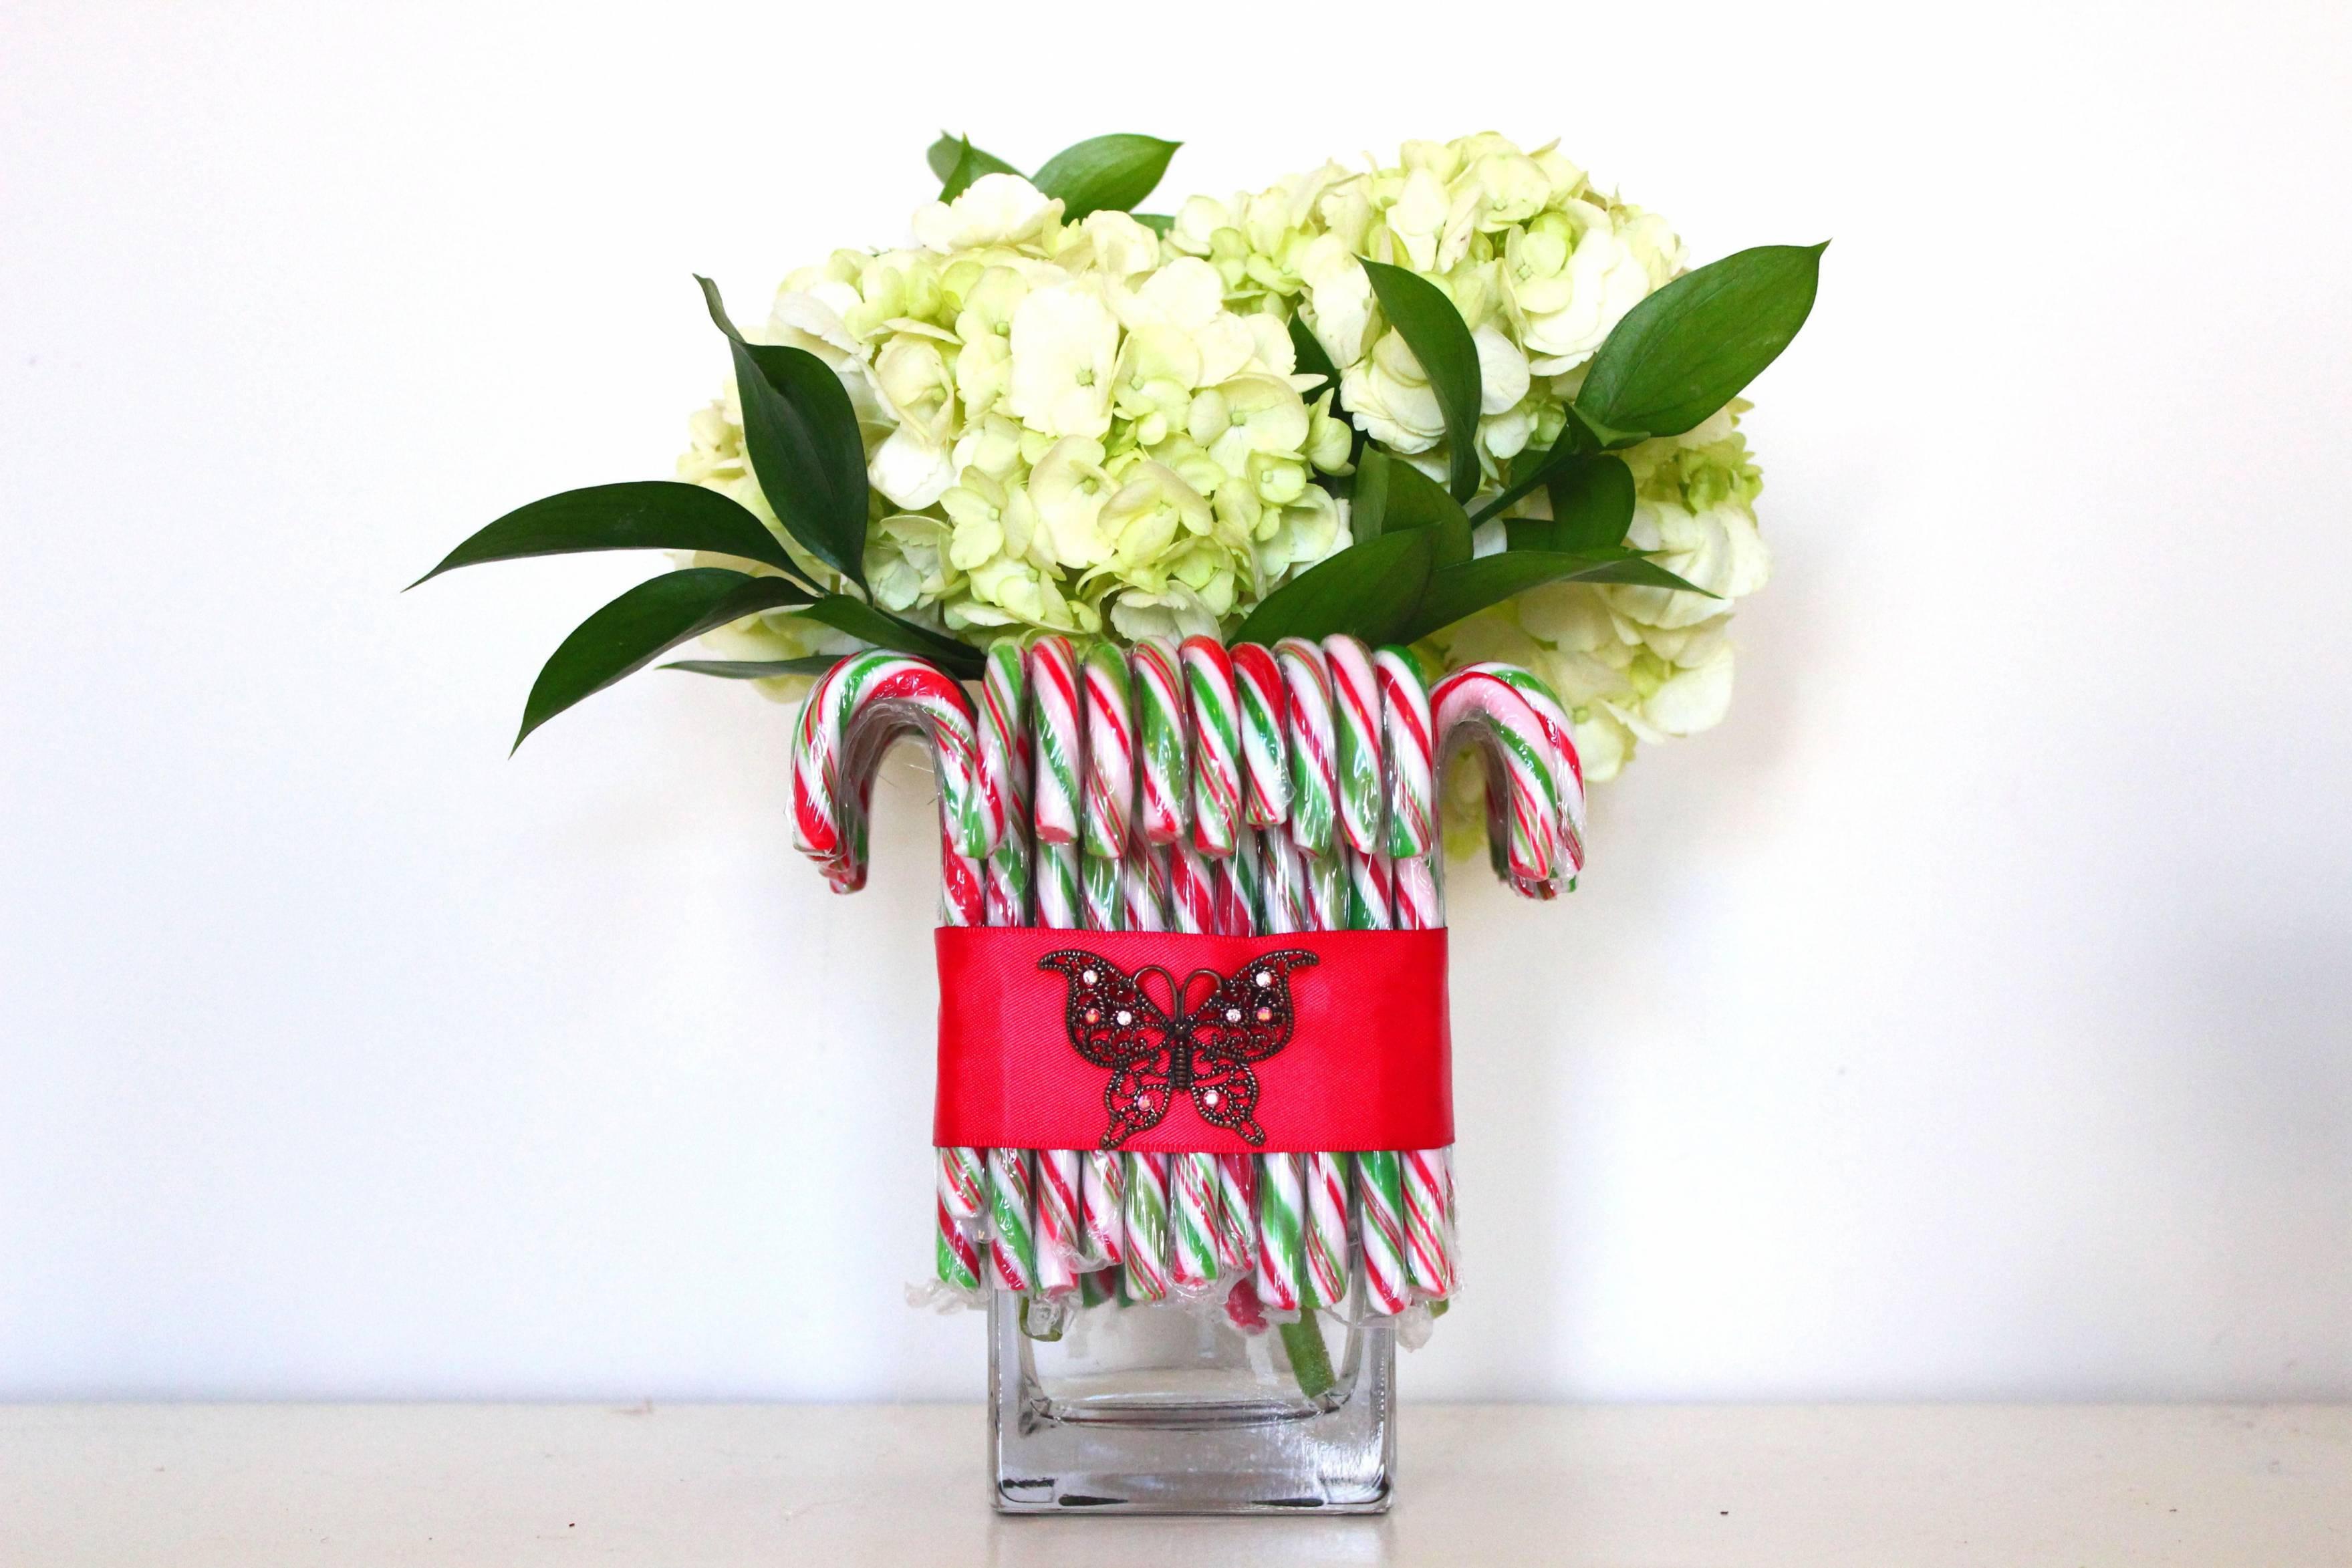 Cheap Vases Walmart Of 10 Flower Pot Ideas Favorite for Elegant Room Splusna Com Page within Cool Flower Pots Unique Living Room Walmart Flower Vases Lovely H Vases Candy Vase I 0d